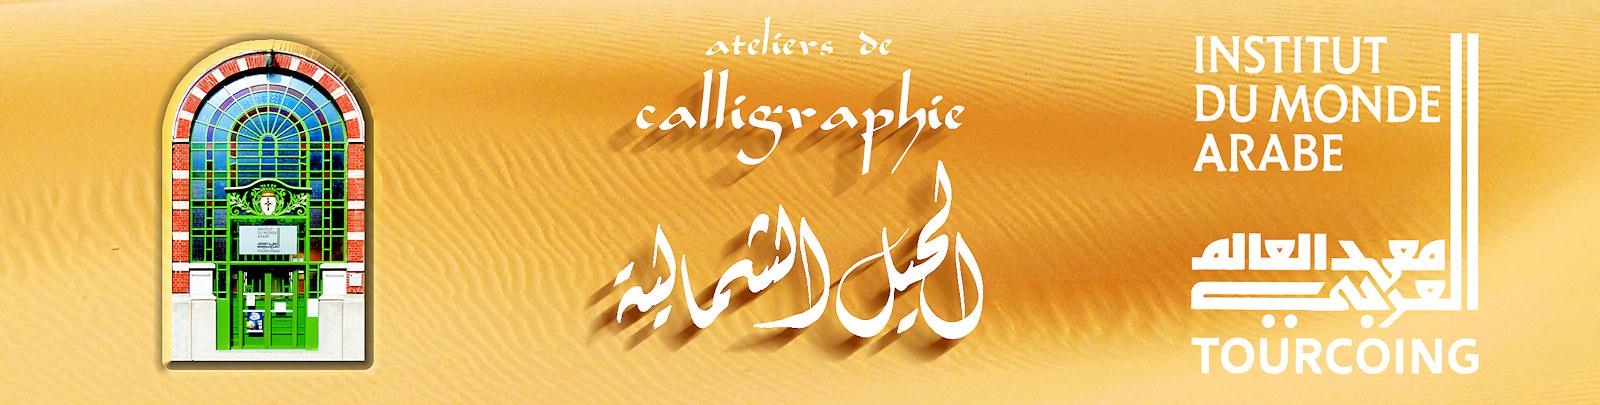 Cours de Calligraphie - Institut du monde arabe, Tourcoing.